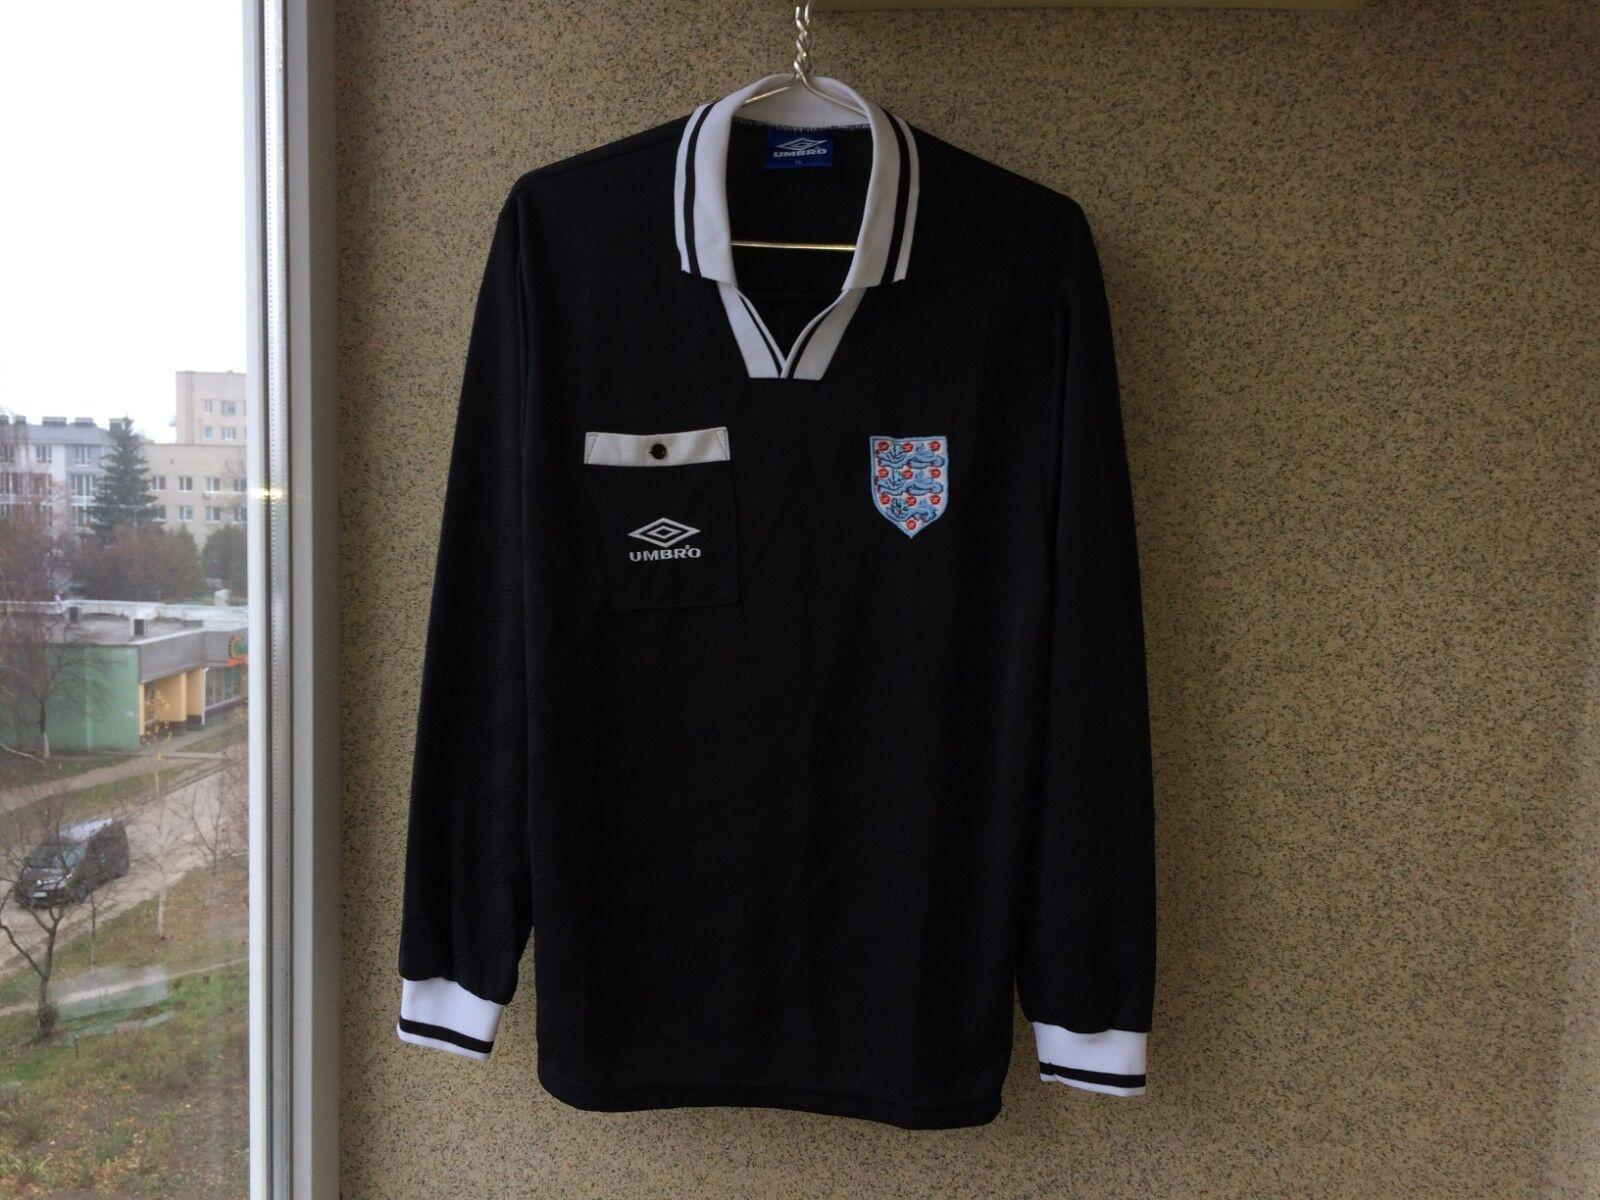 Football League 1998 2000 Umbro Referee Shirt XL OLD Soccer Camiseta long Sleeve